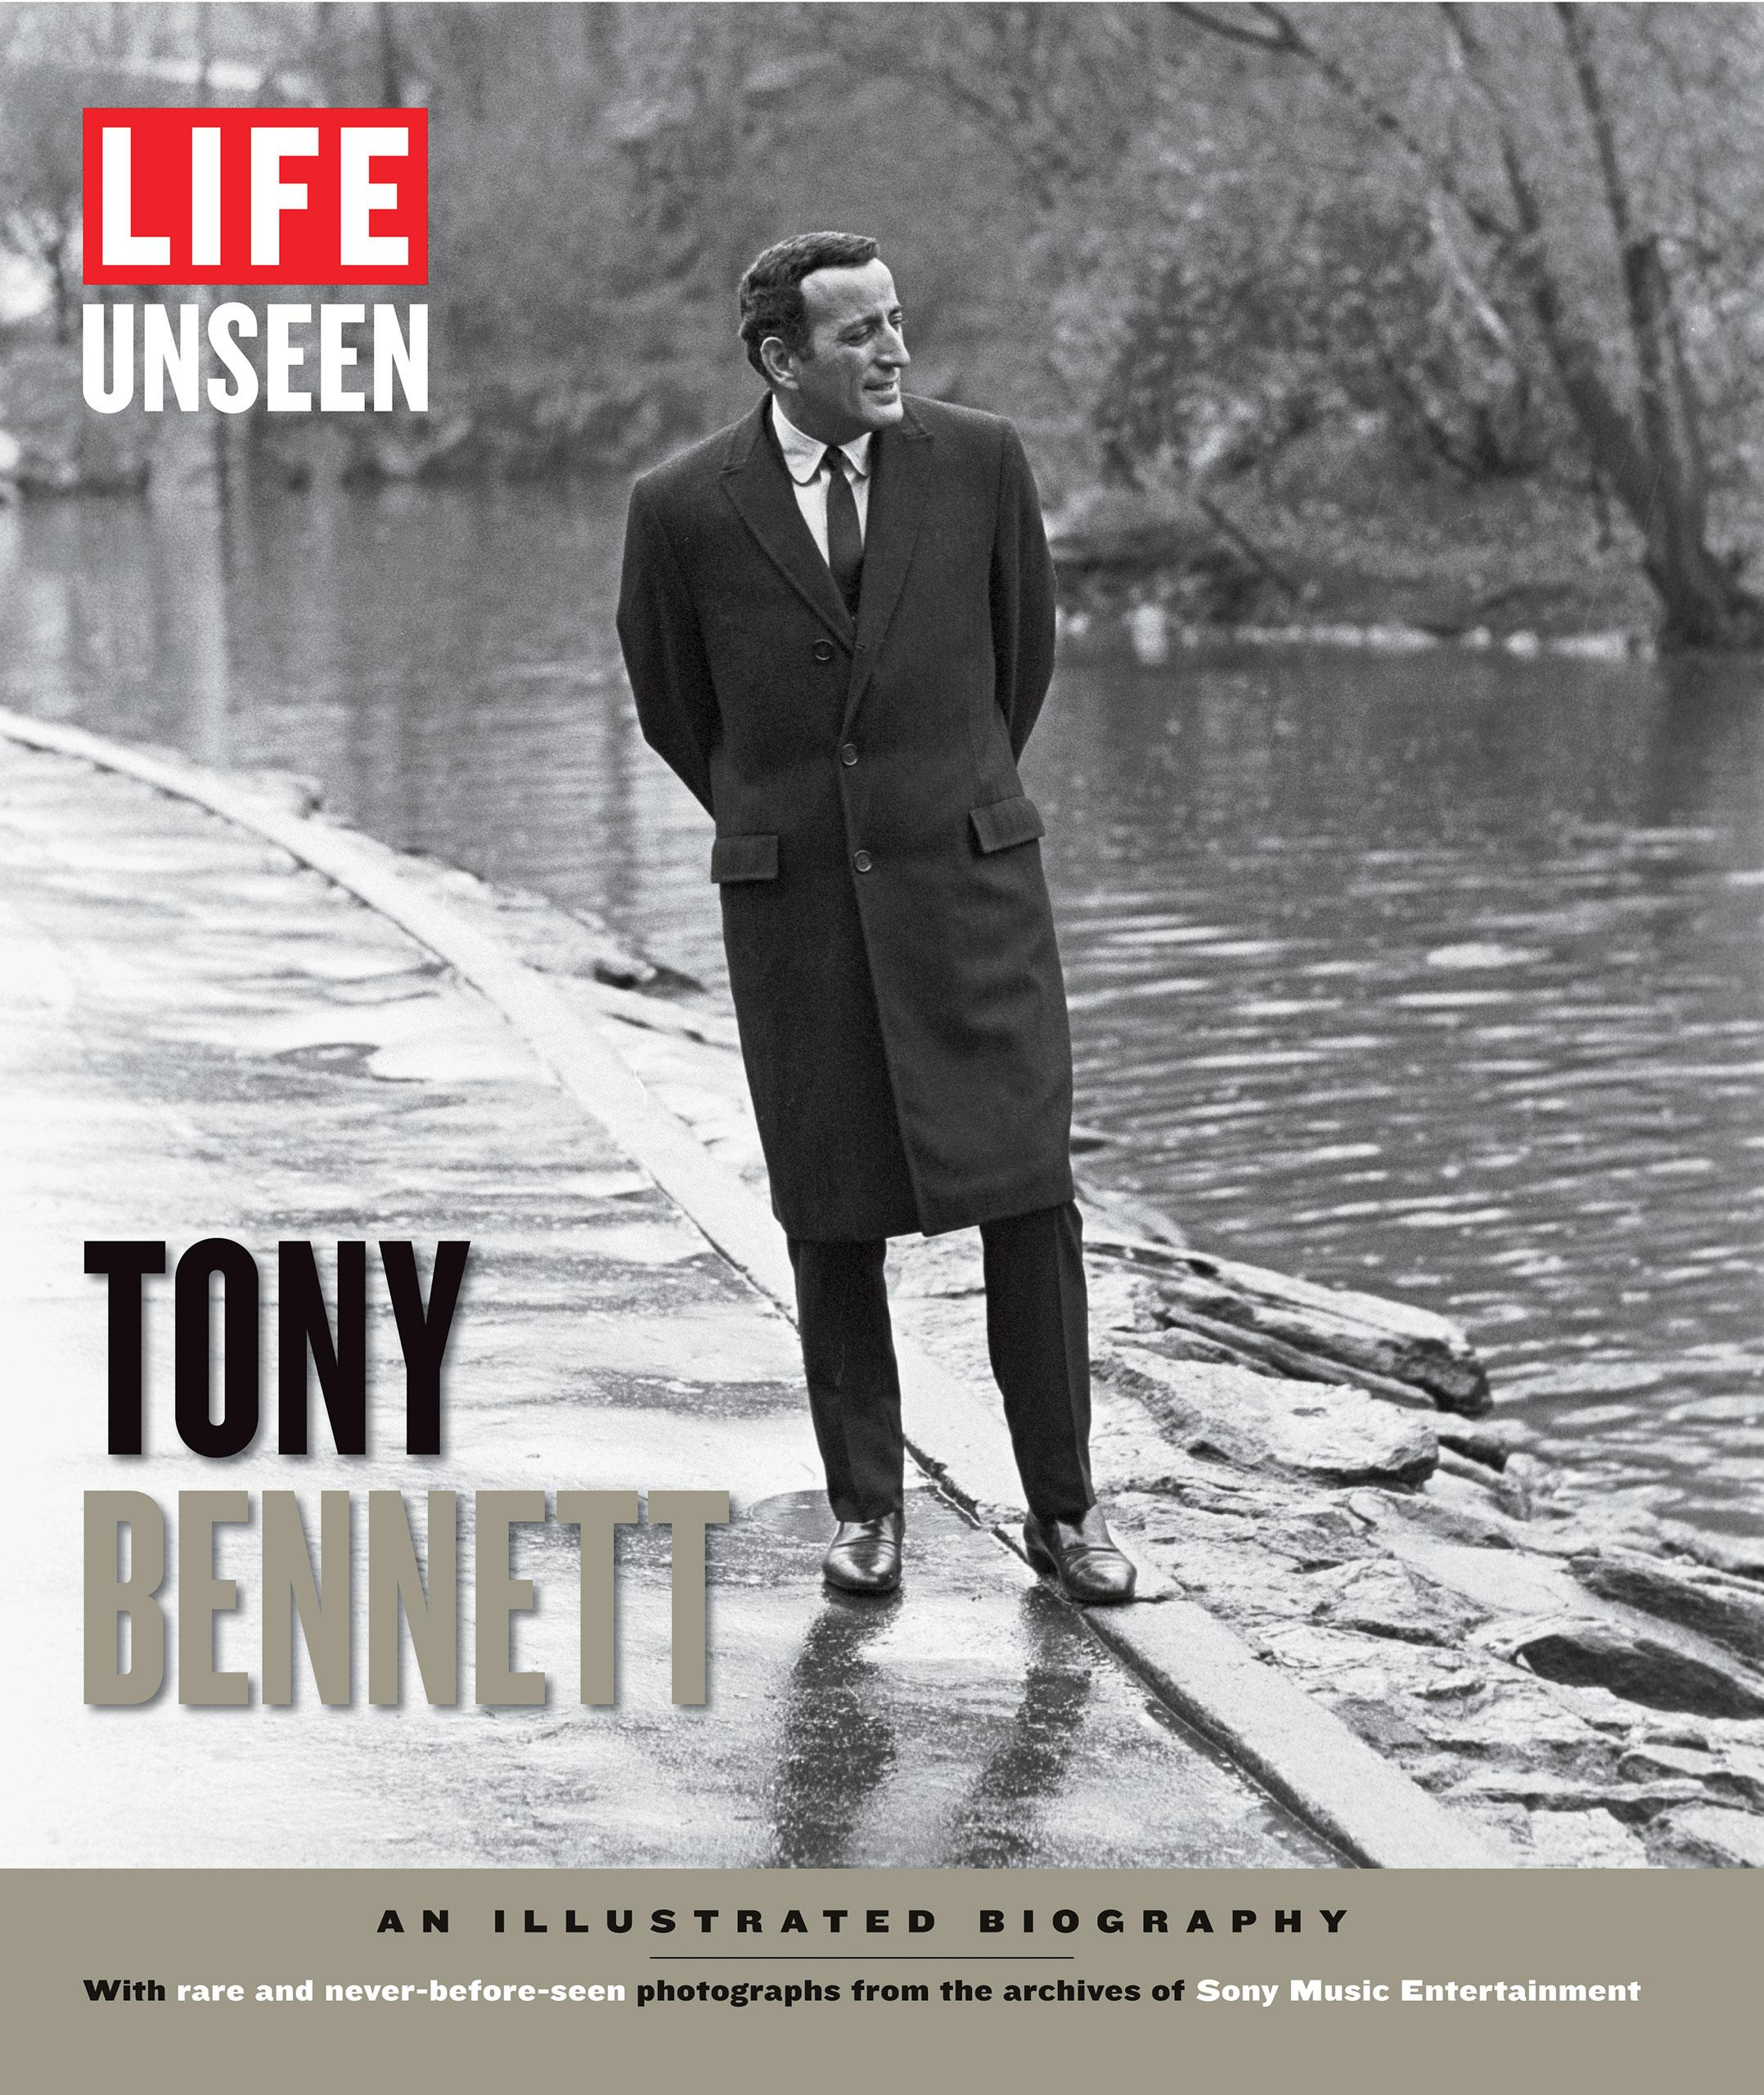 LIFE Unseen: Tony Bennett (LIFE Books, 2014)